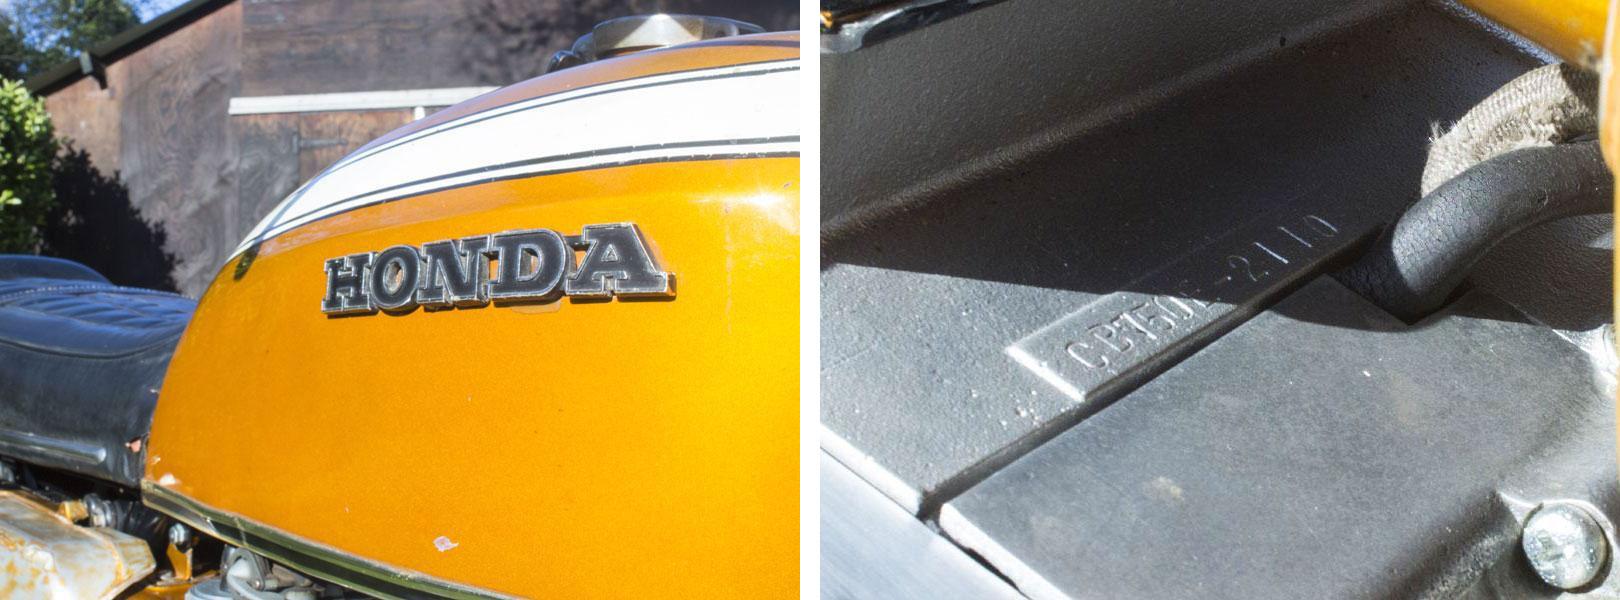 Original 1969 Honda CB750 Sandcast Prototype